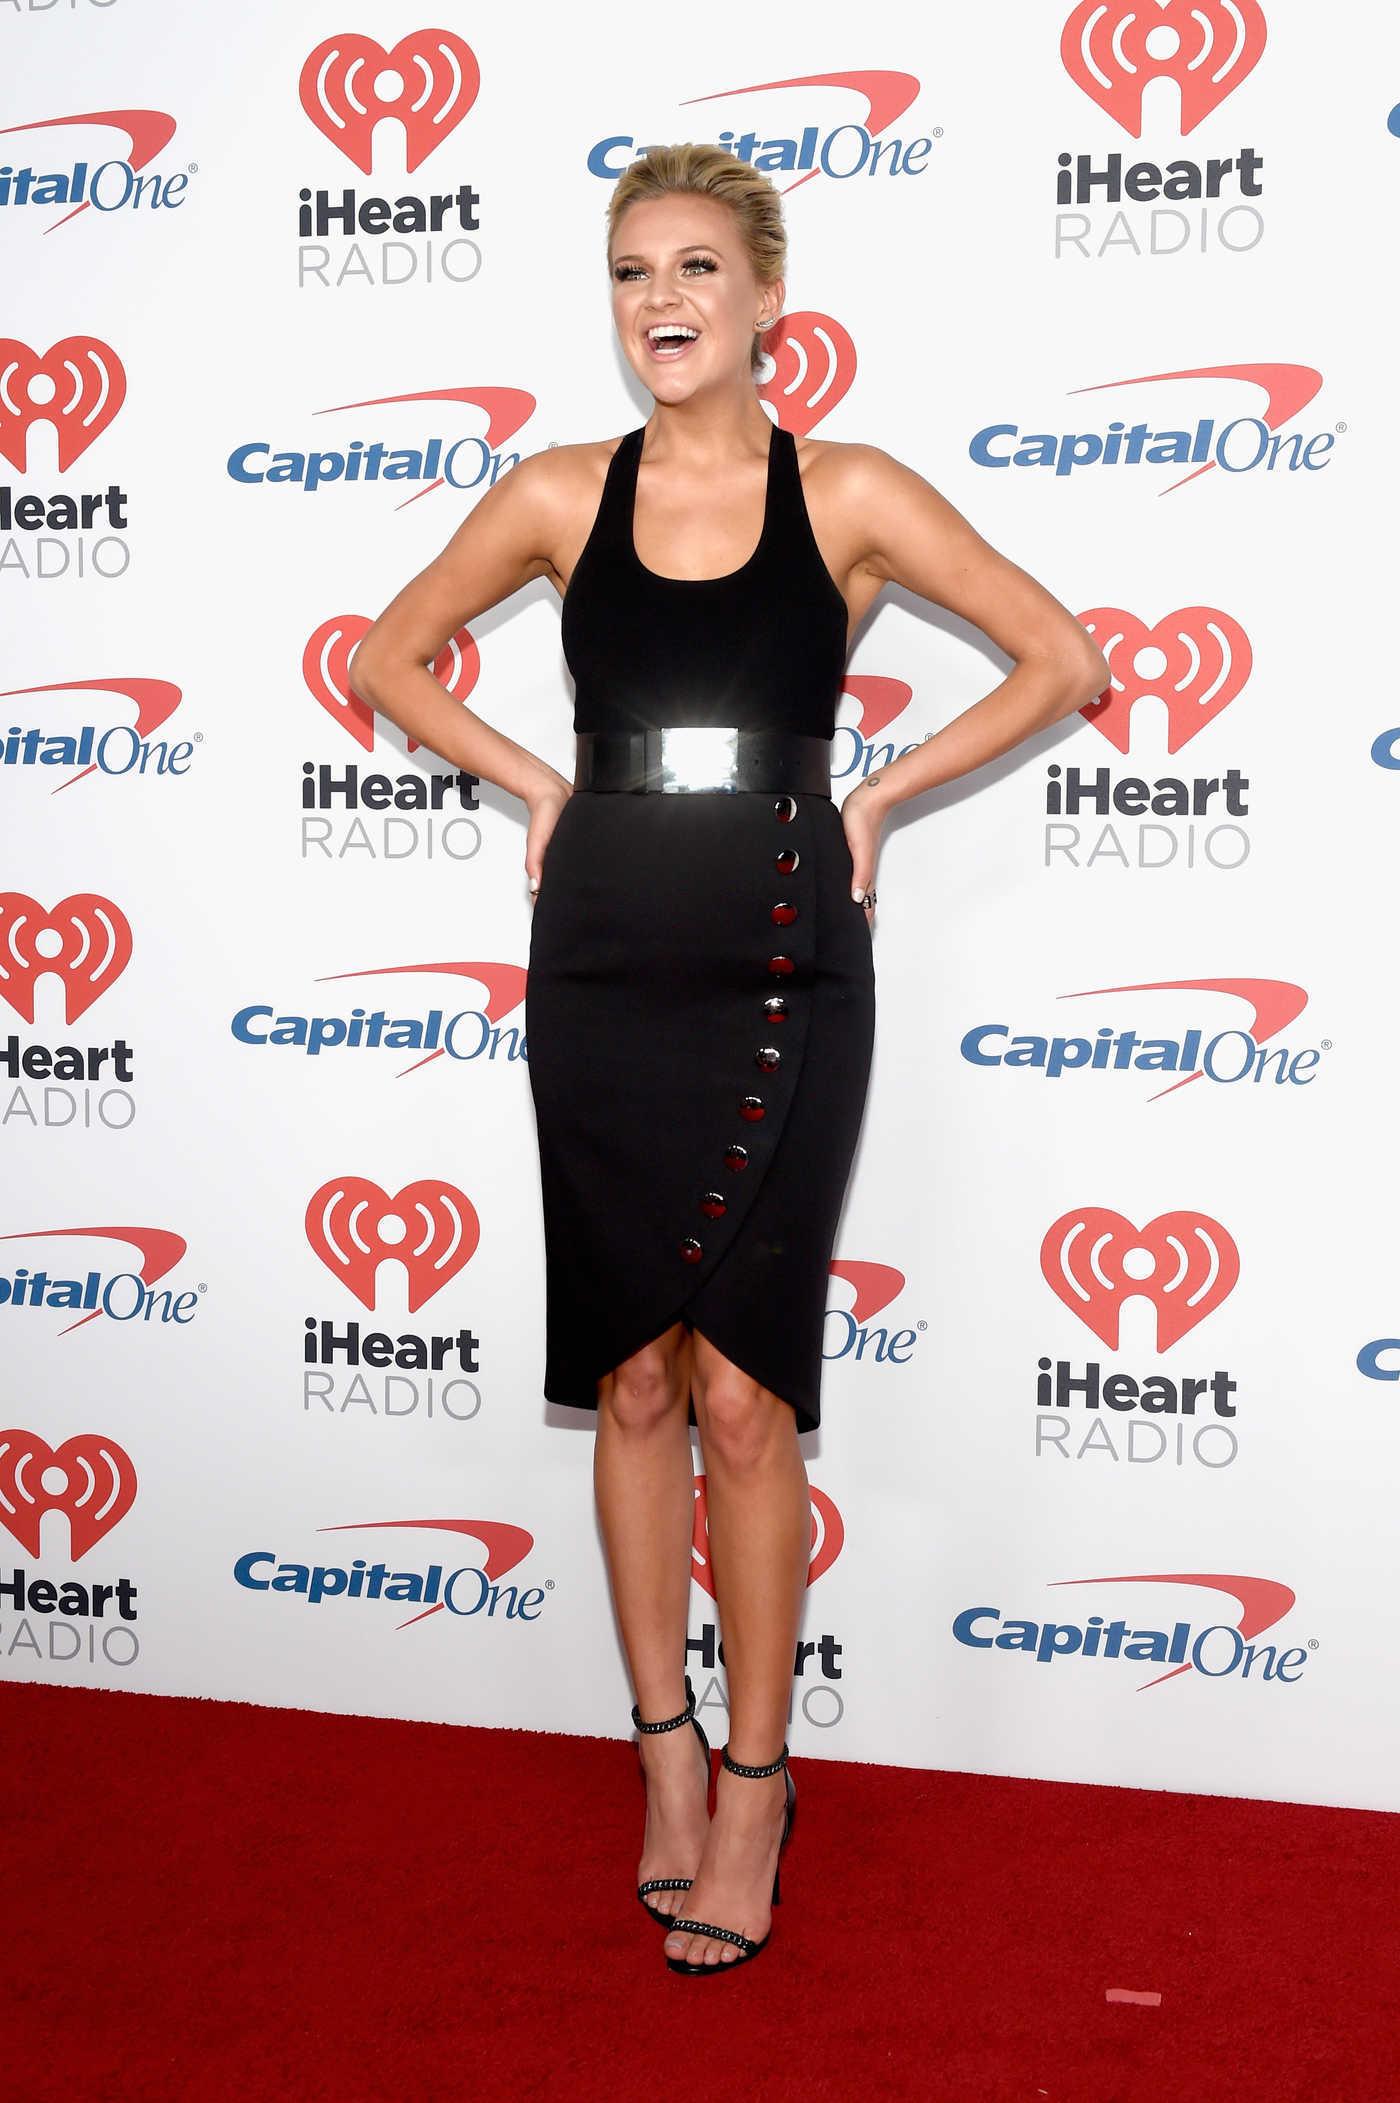 Kelsea Ballerini at iHeart Radio Festival in Las Vegas 09/22/2017